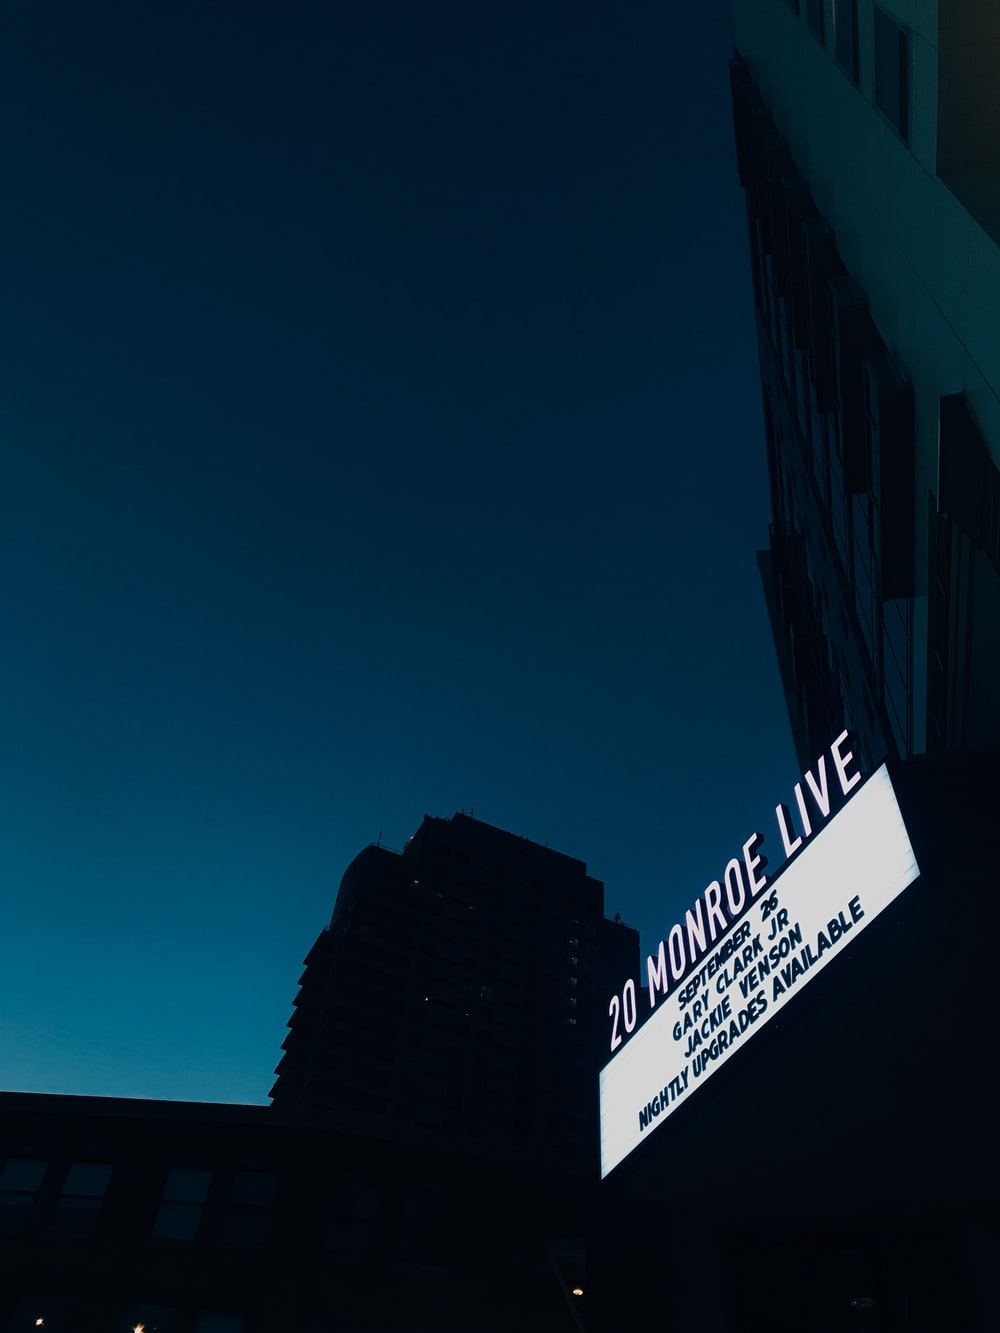 20 Monroe Live signage